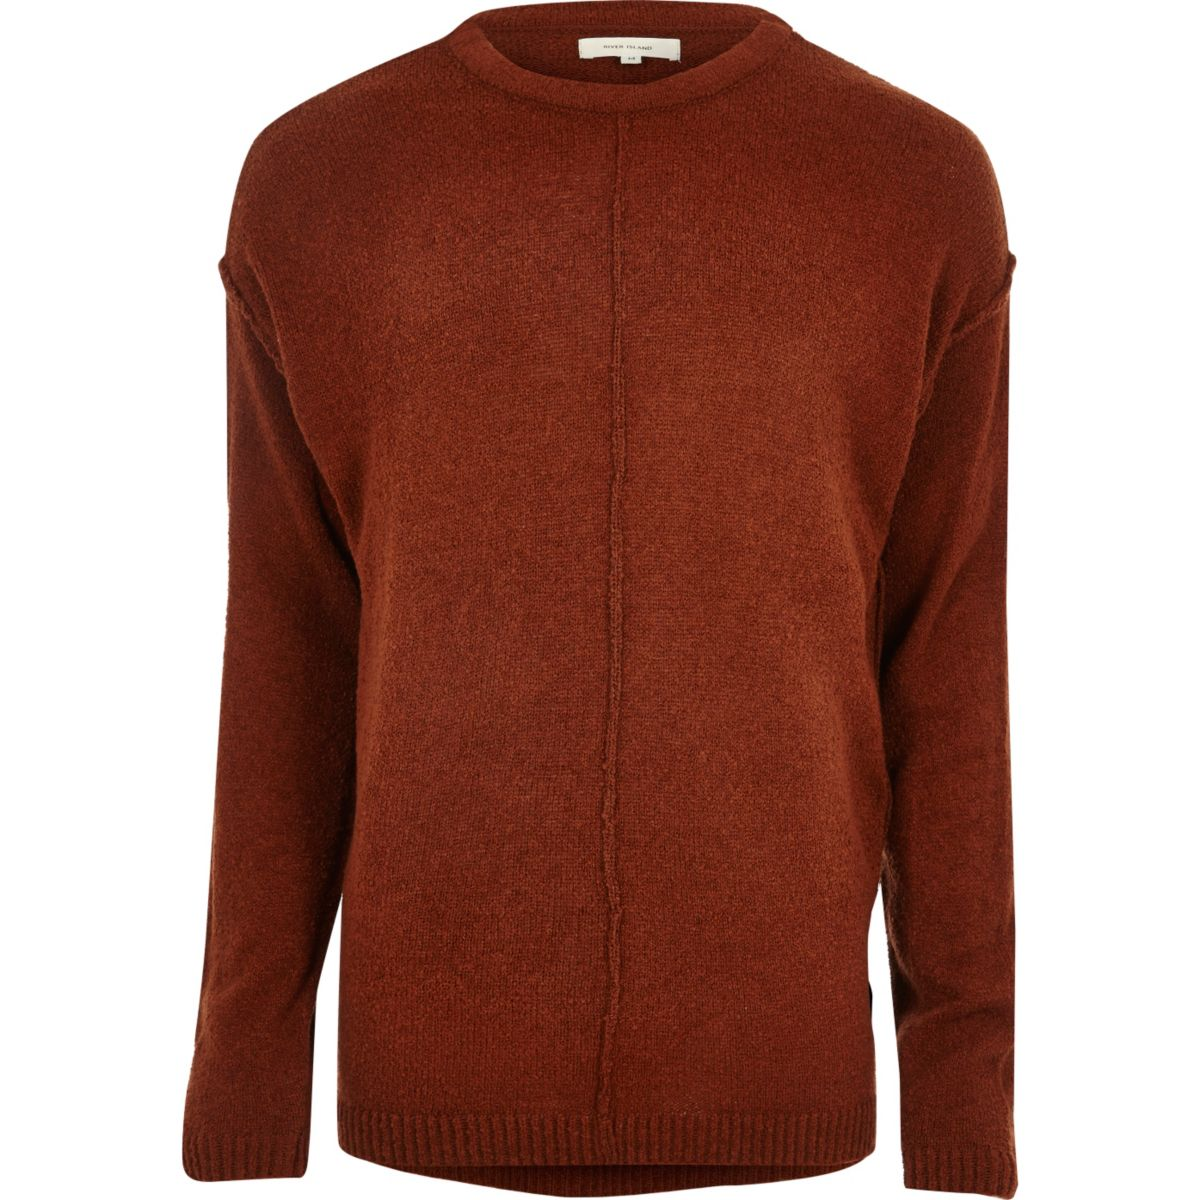 Rust red stitch sweater